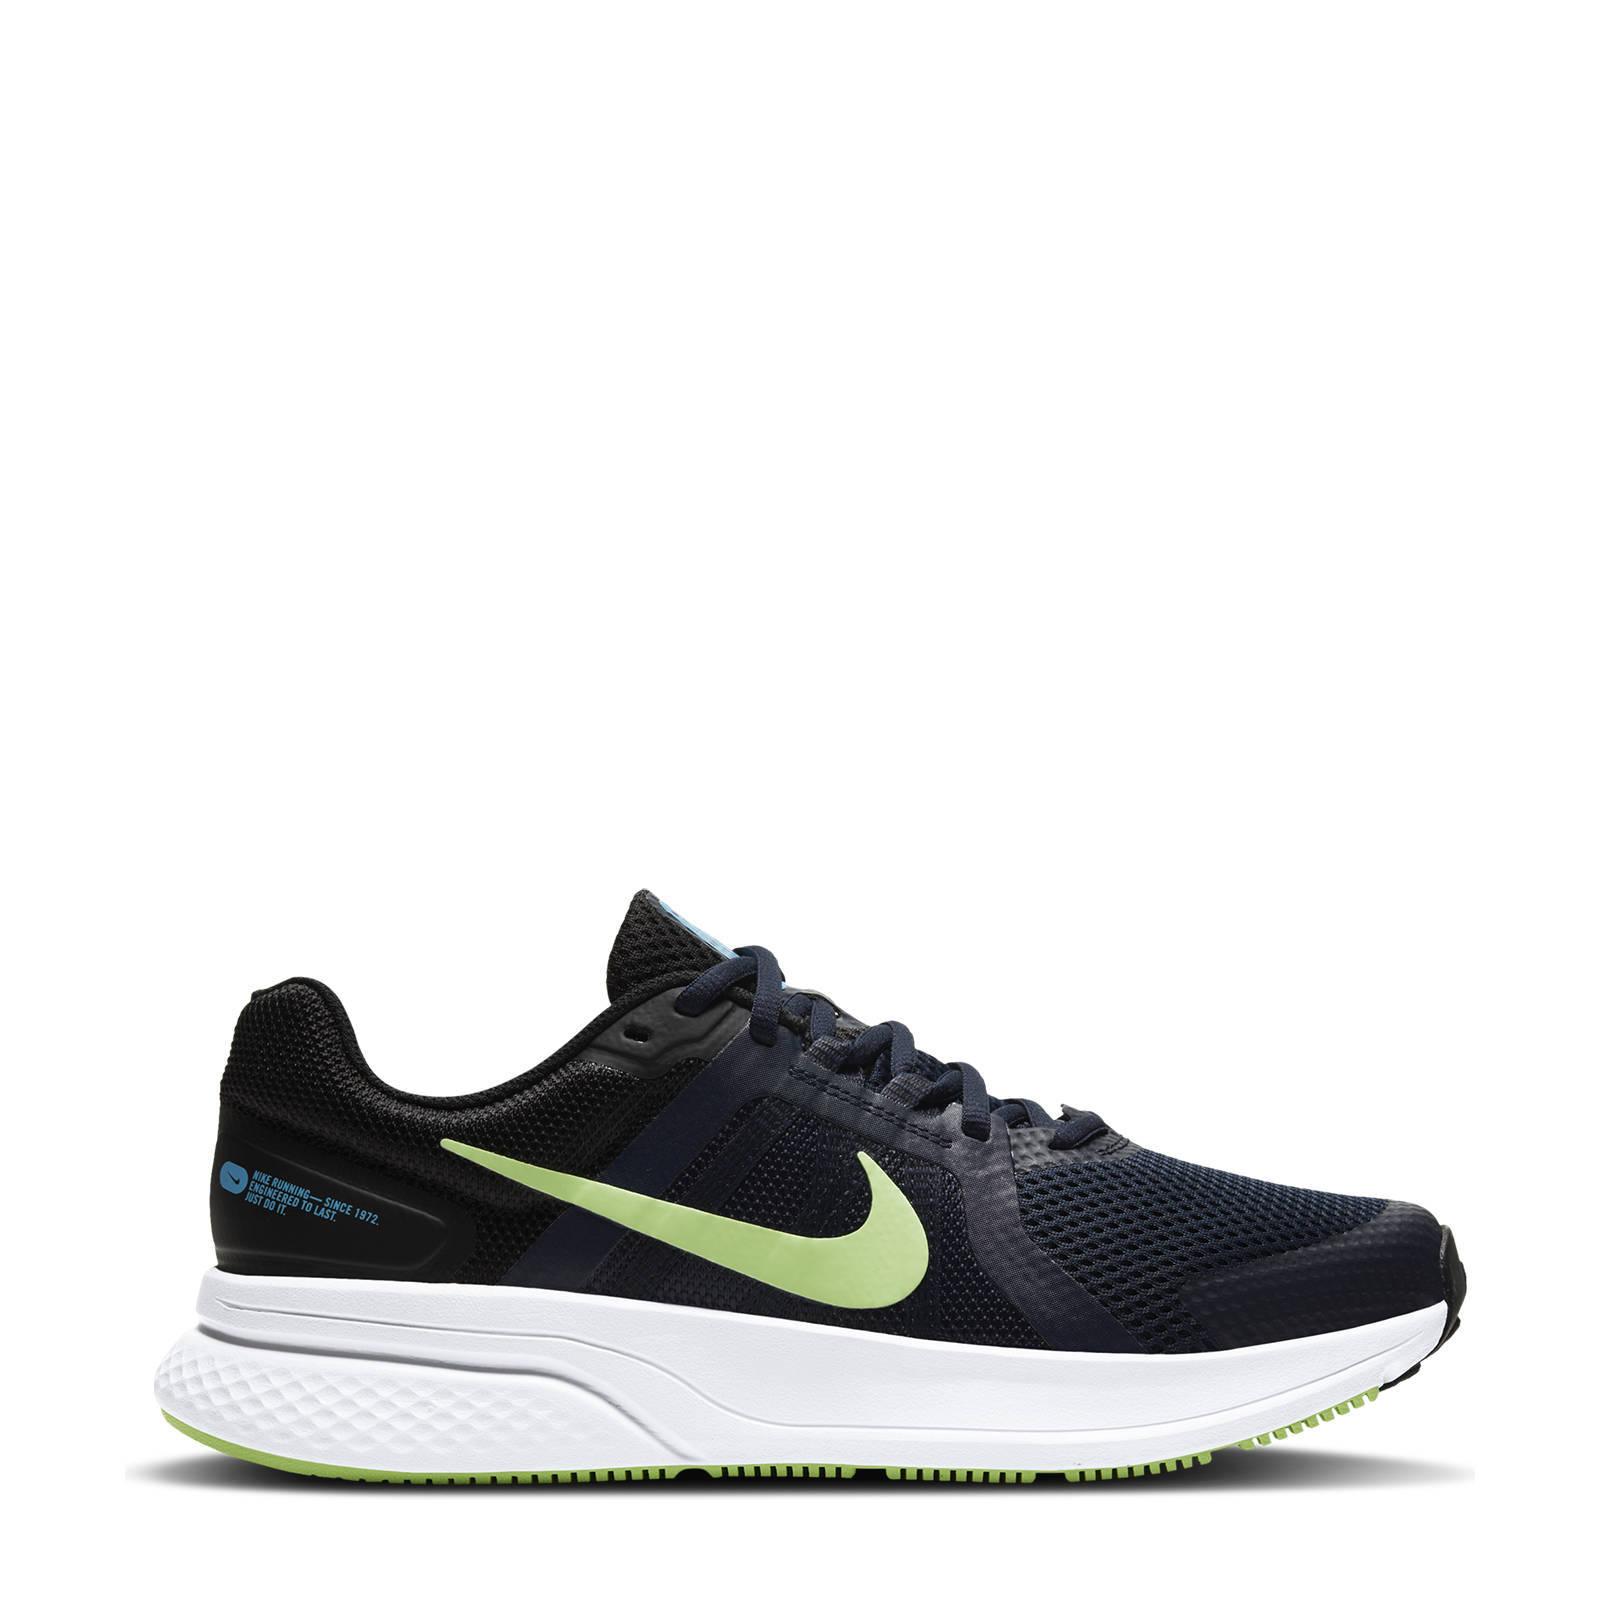 Nike Run Swift 2 hardloopschoenen grijs/zwart-wit online kopen